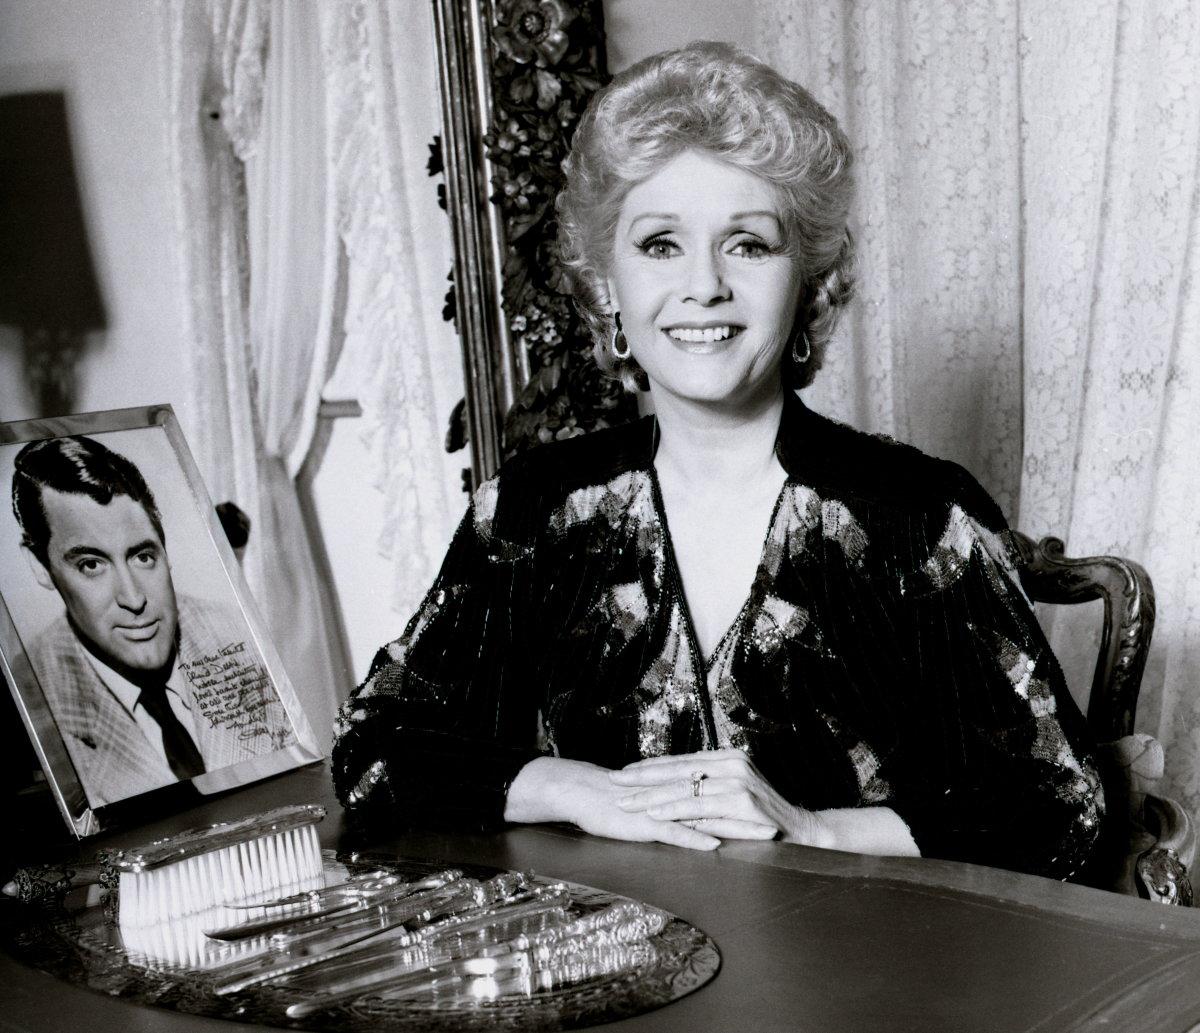 Debbie Reynolds, born April 1, 1932.